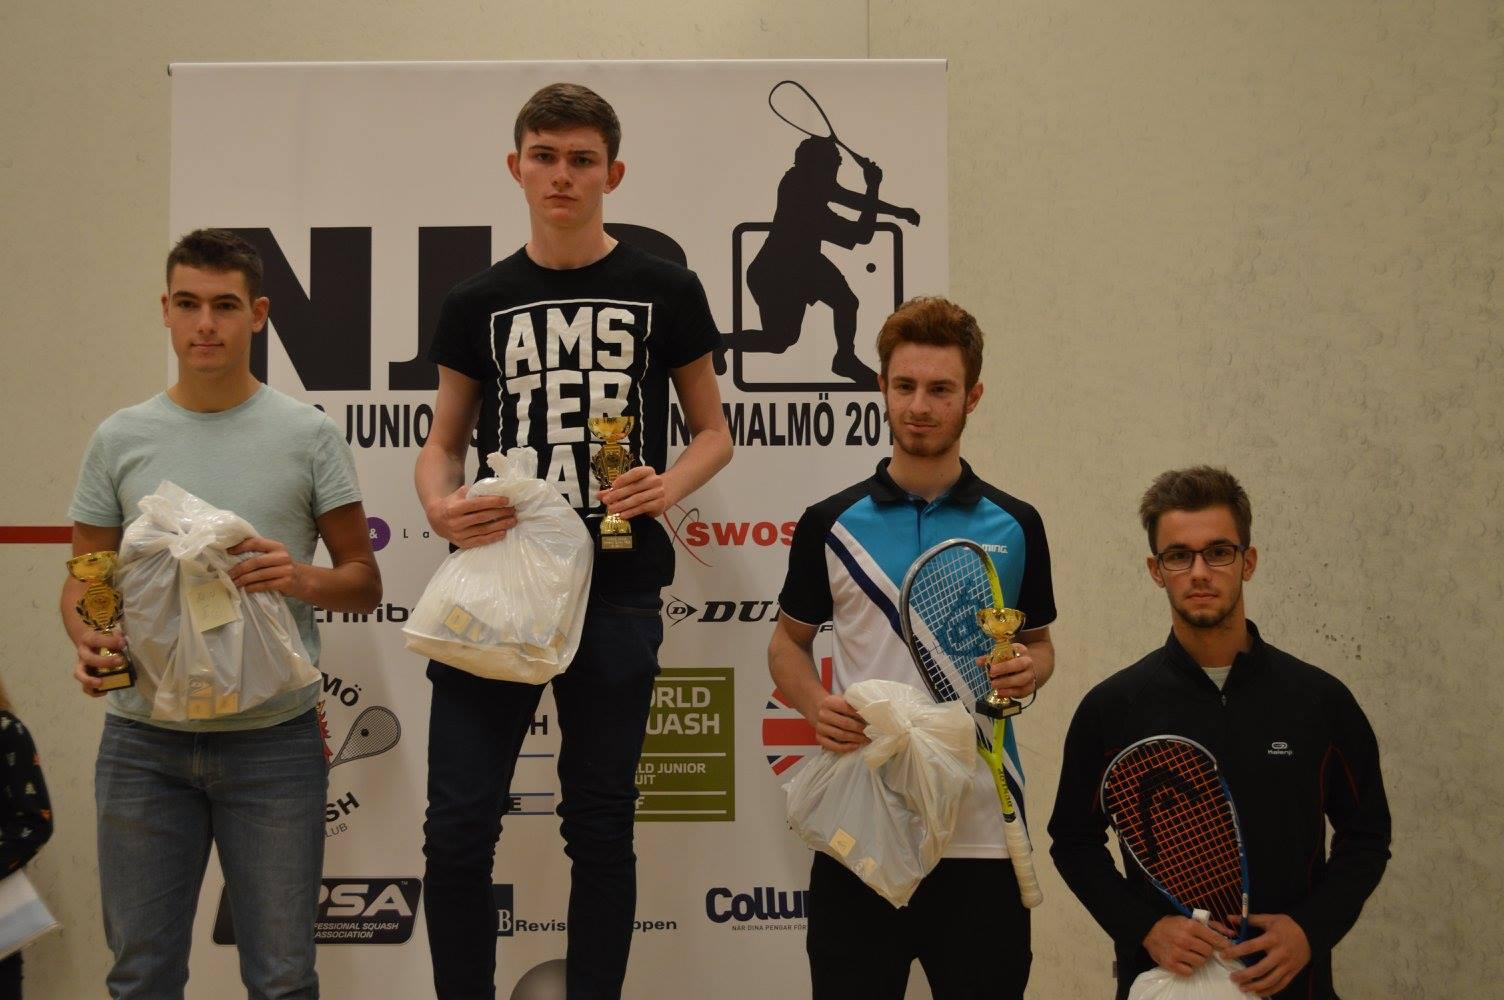 Patrick O'Sullivan - Nordic Open 15 U17 Winner